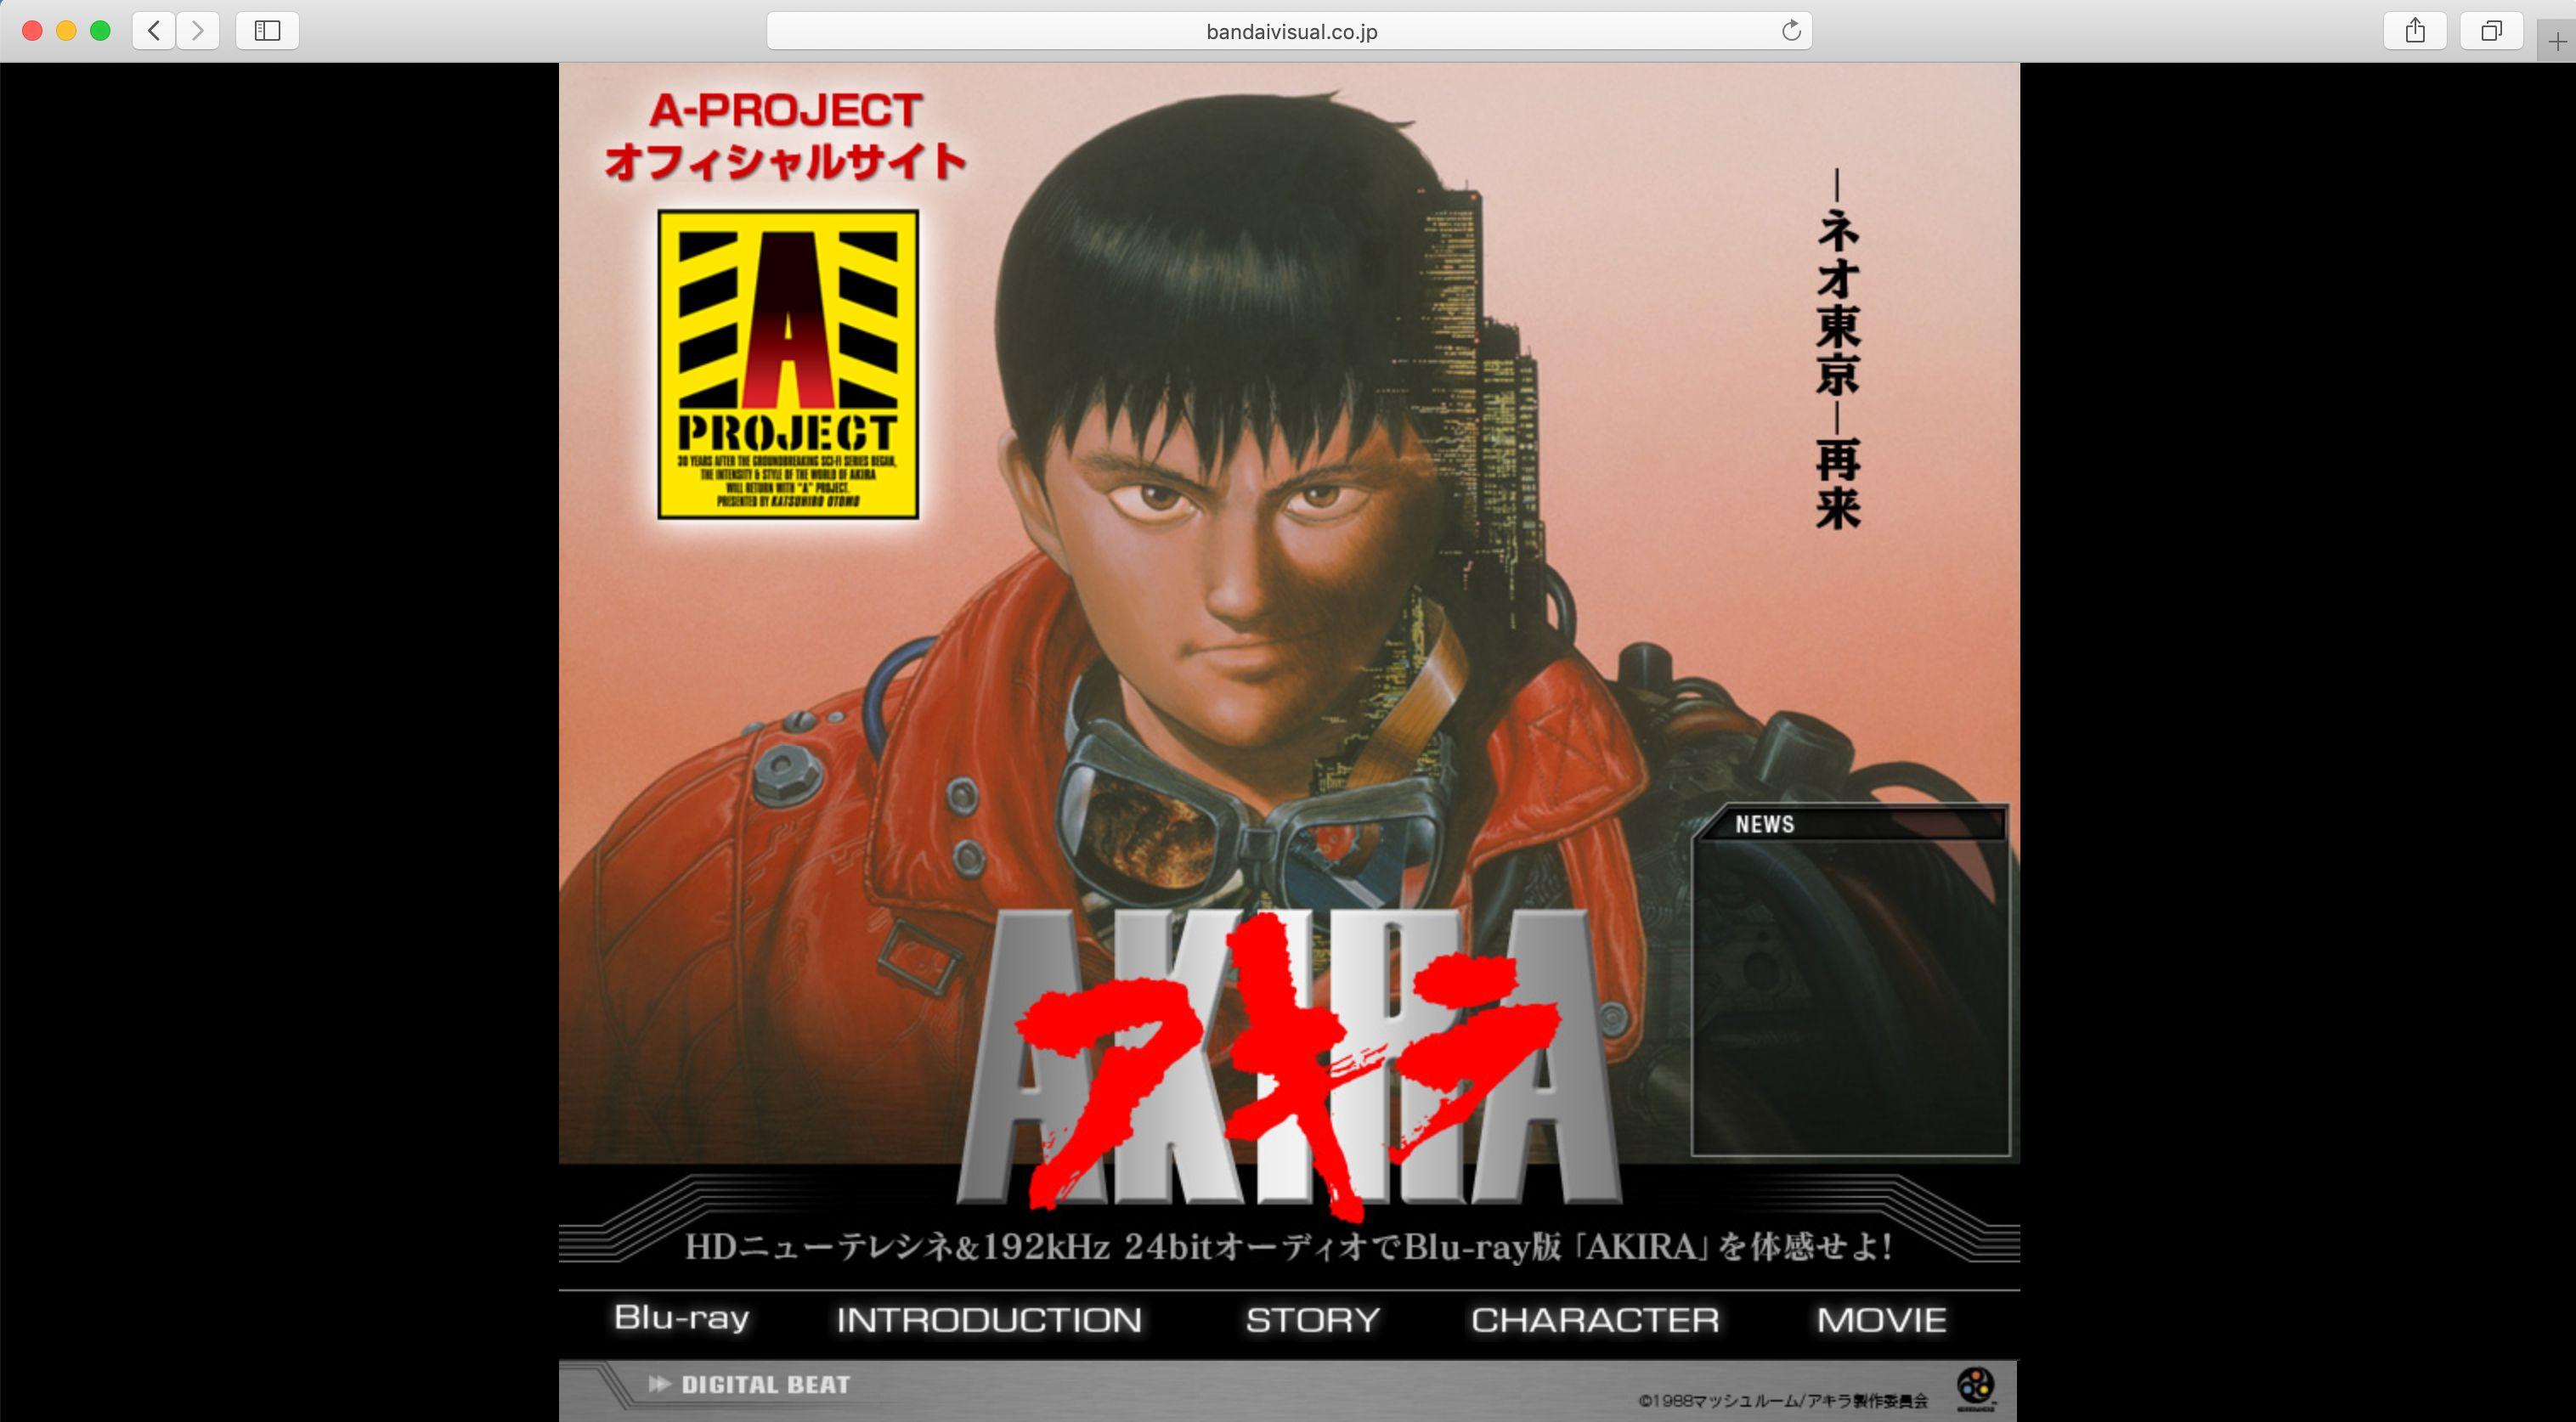 「AKIRA」のハリウッド実写化、公開決定 どうなる…!?